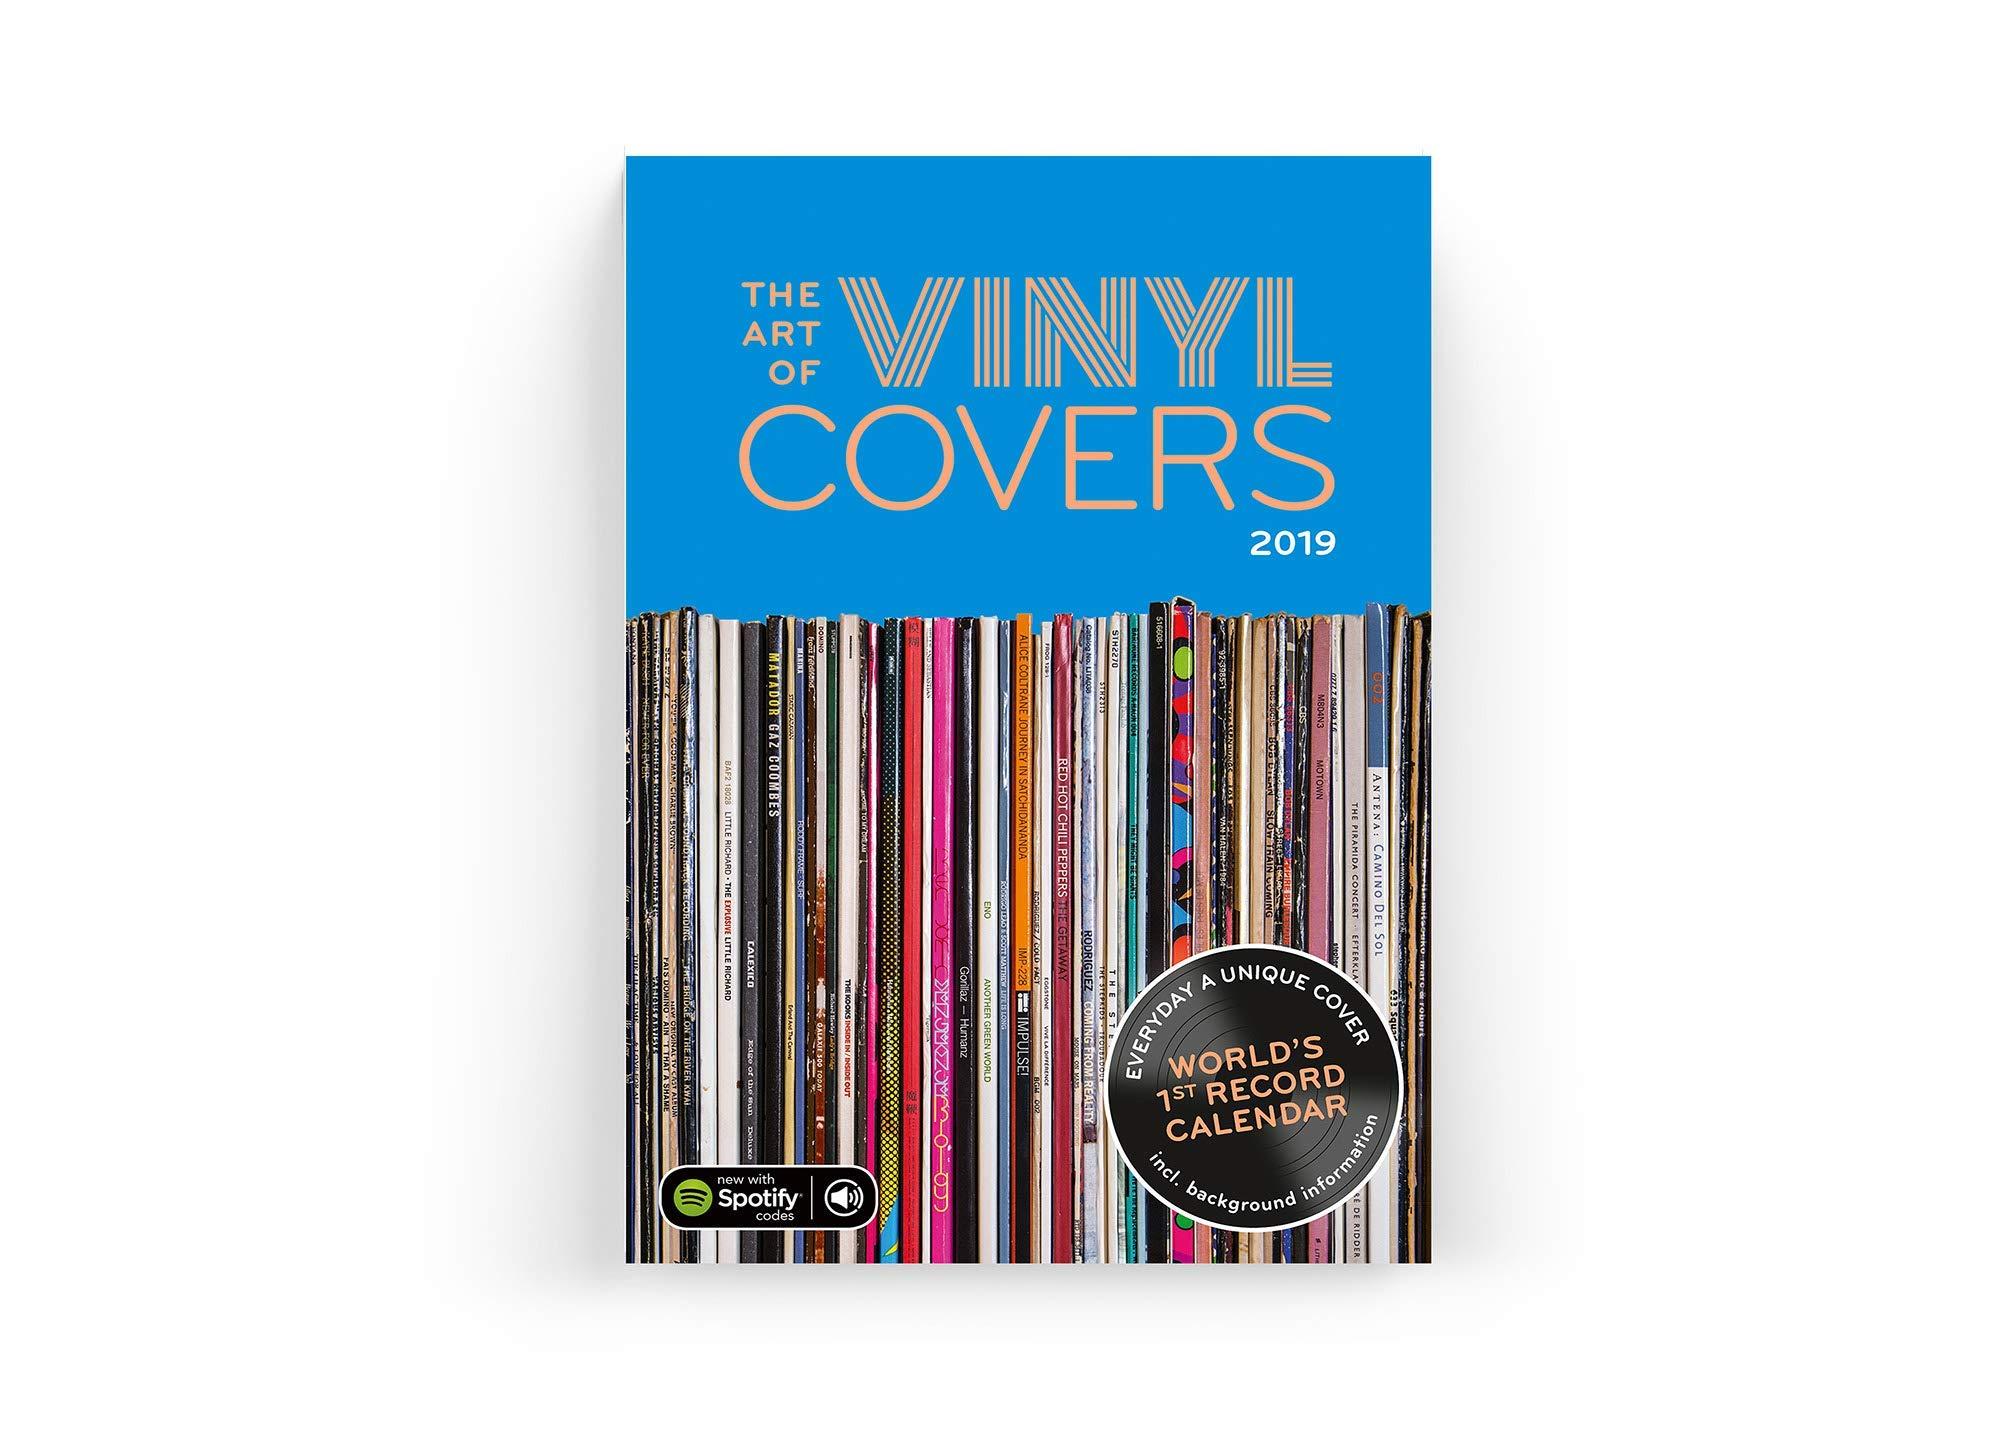 The The Art of Vinyl Covers Calendar 2019 Calendars 2019 ...